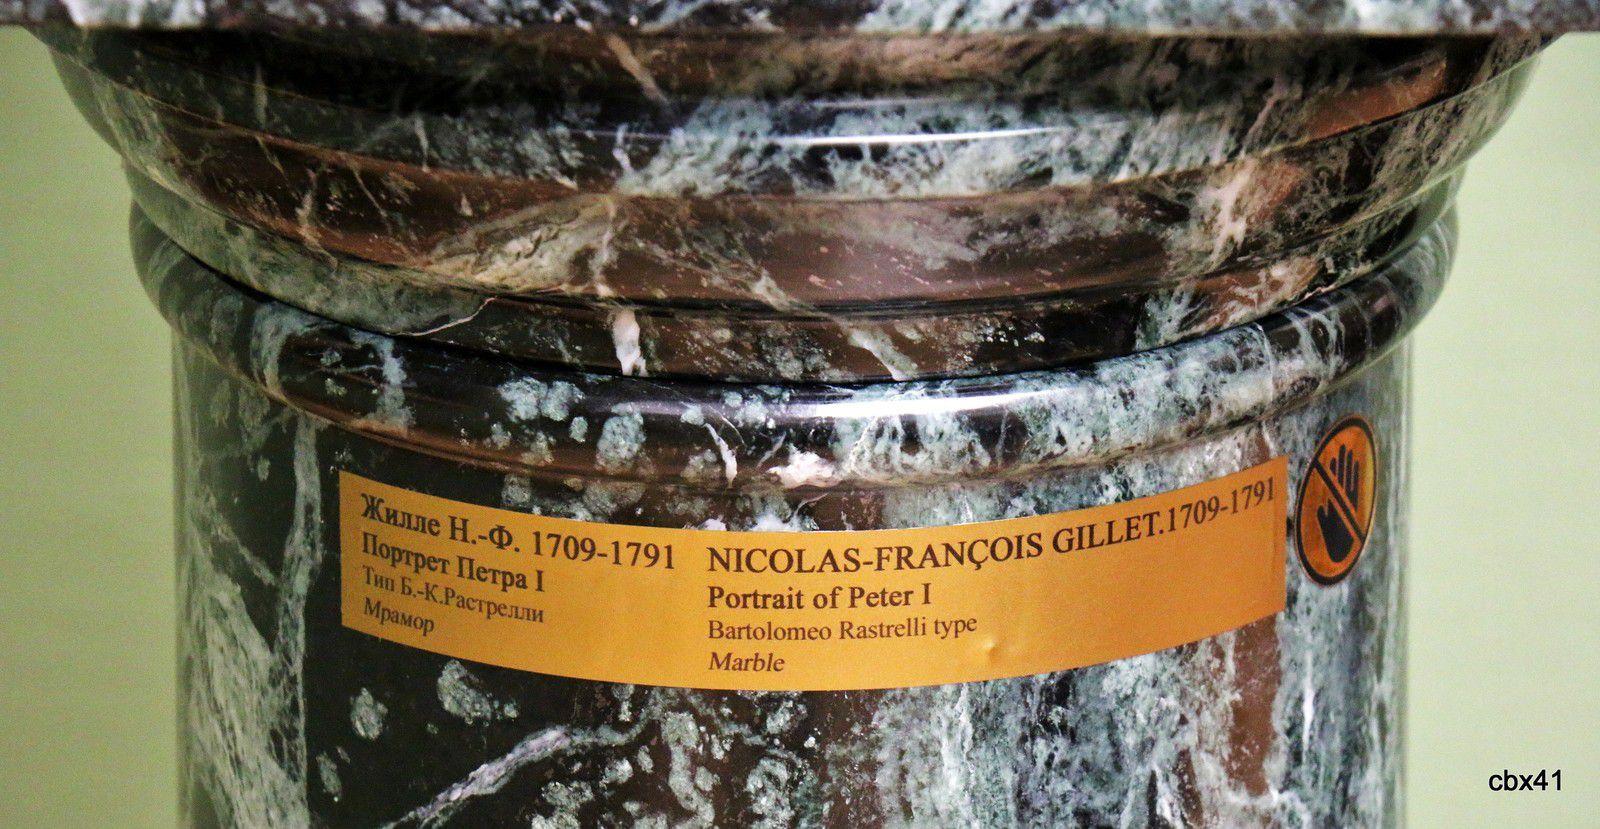 Nicolas-François Gillet, Buste de Pierre Ier le Grand